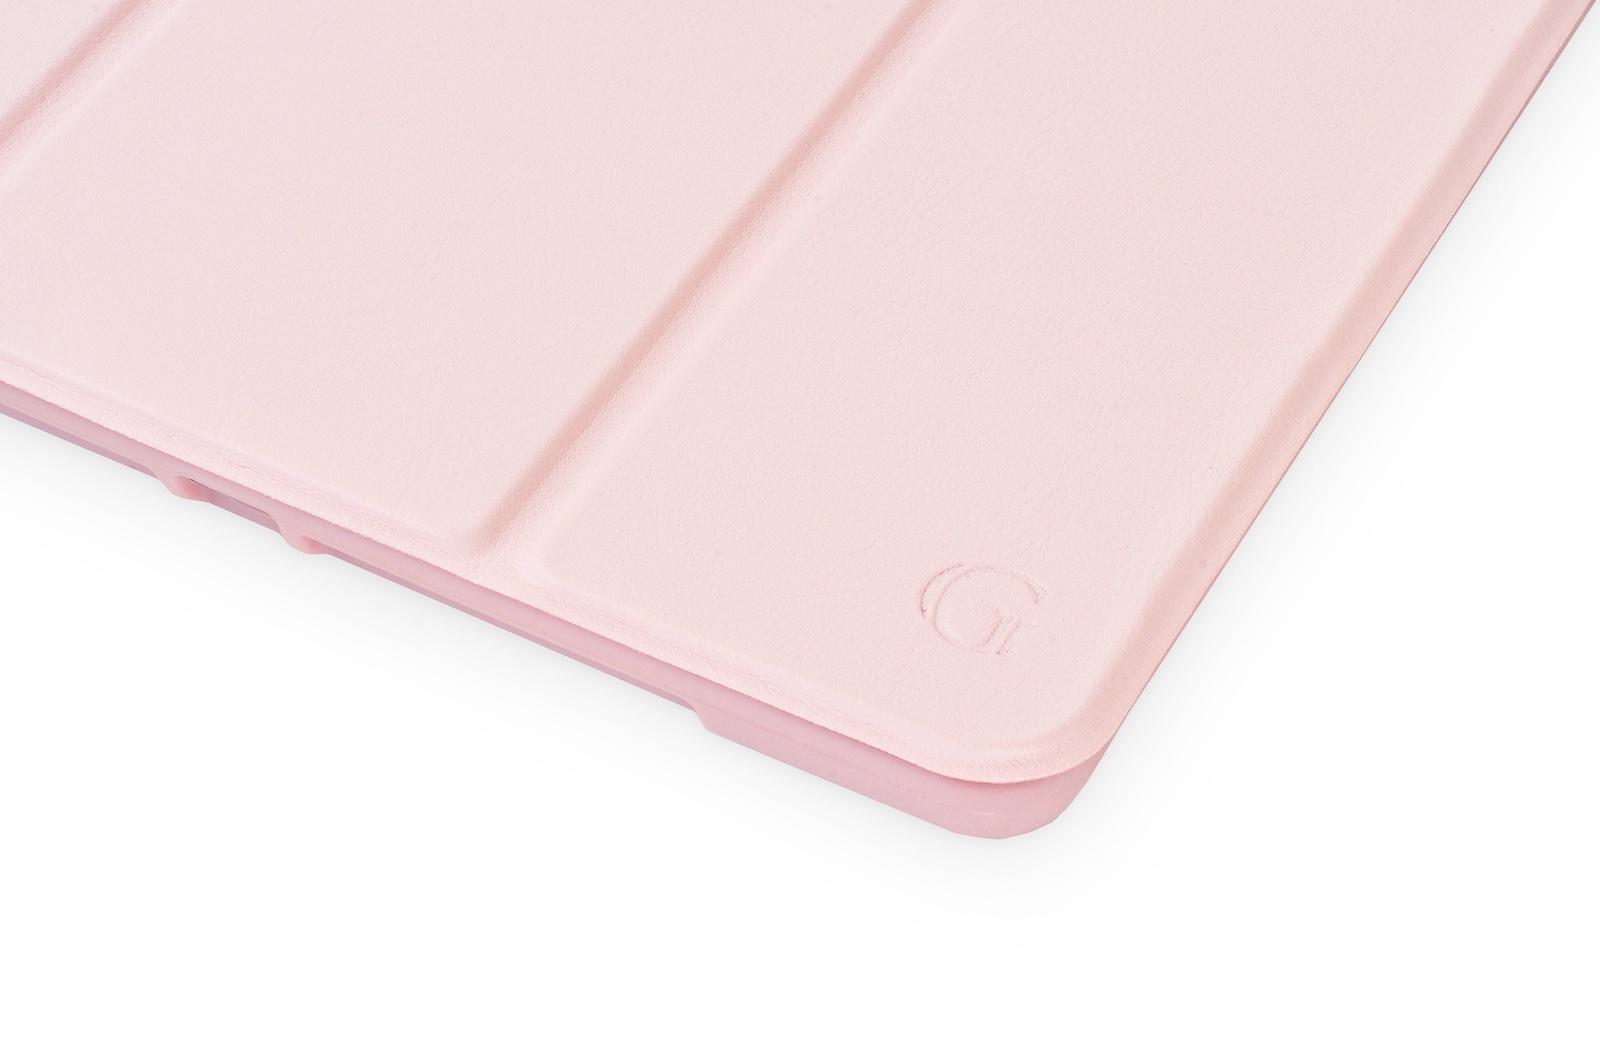 Чехол для планшета Gurdini Leather Series (pen slot) 907384 для Apple iPad Air/Air2/Pro9.7